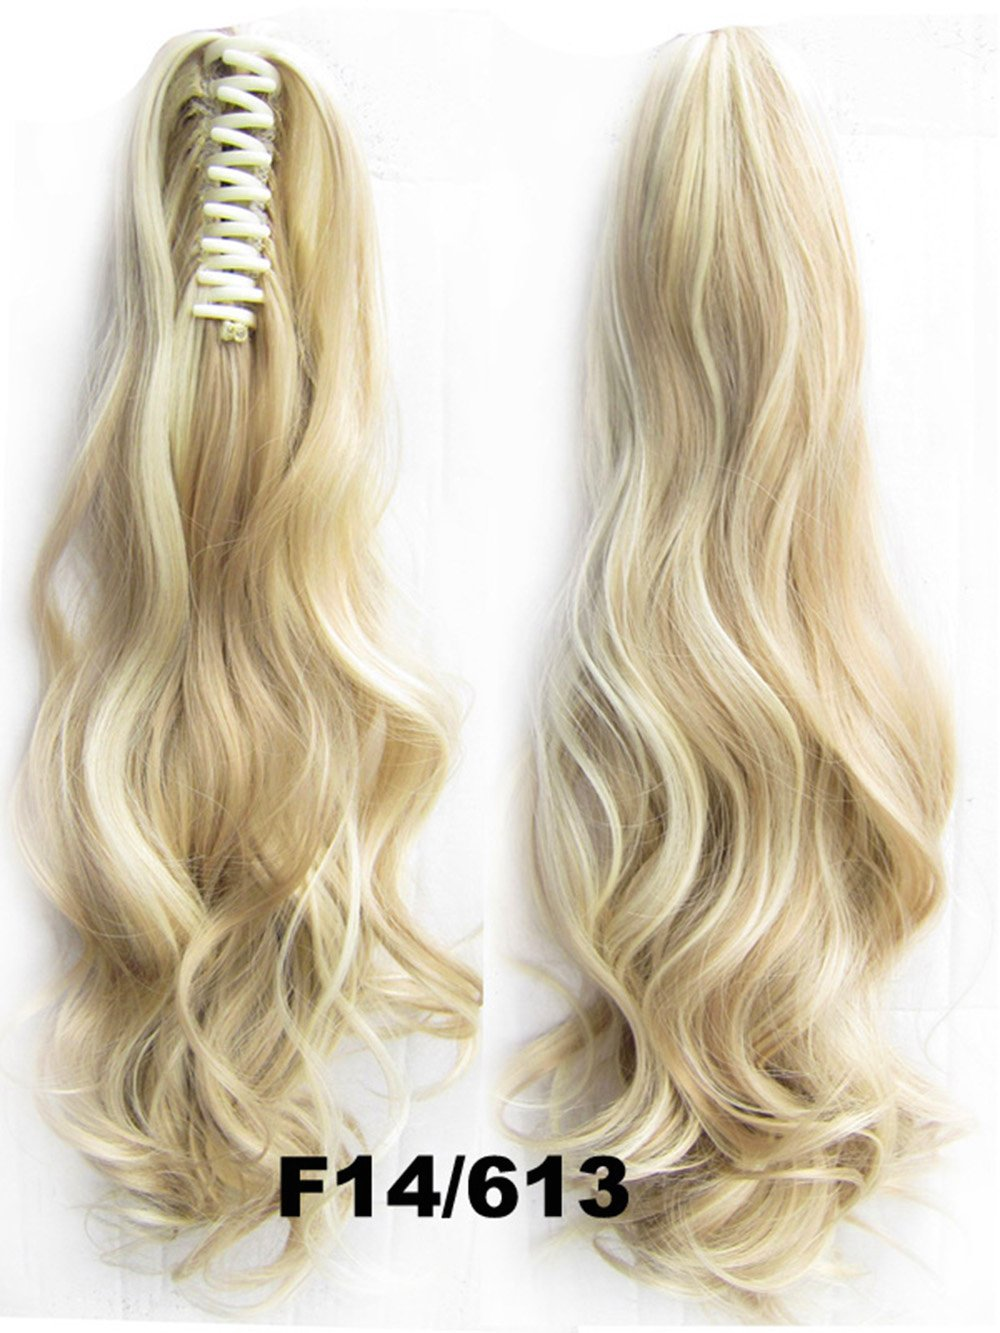 Queen Wig Long wave Clip in/on Wavy Ponytail Hair Extension Hairpiece Claw - #14/613 Medium Blonde/bleach blonde